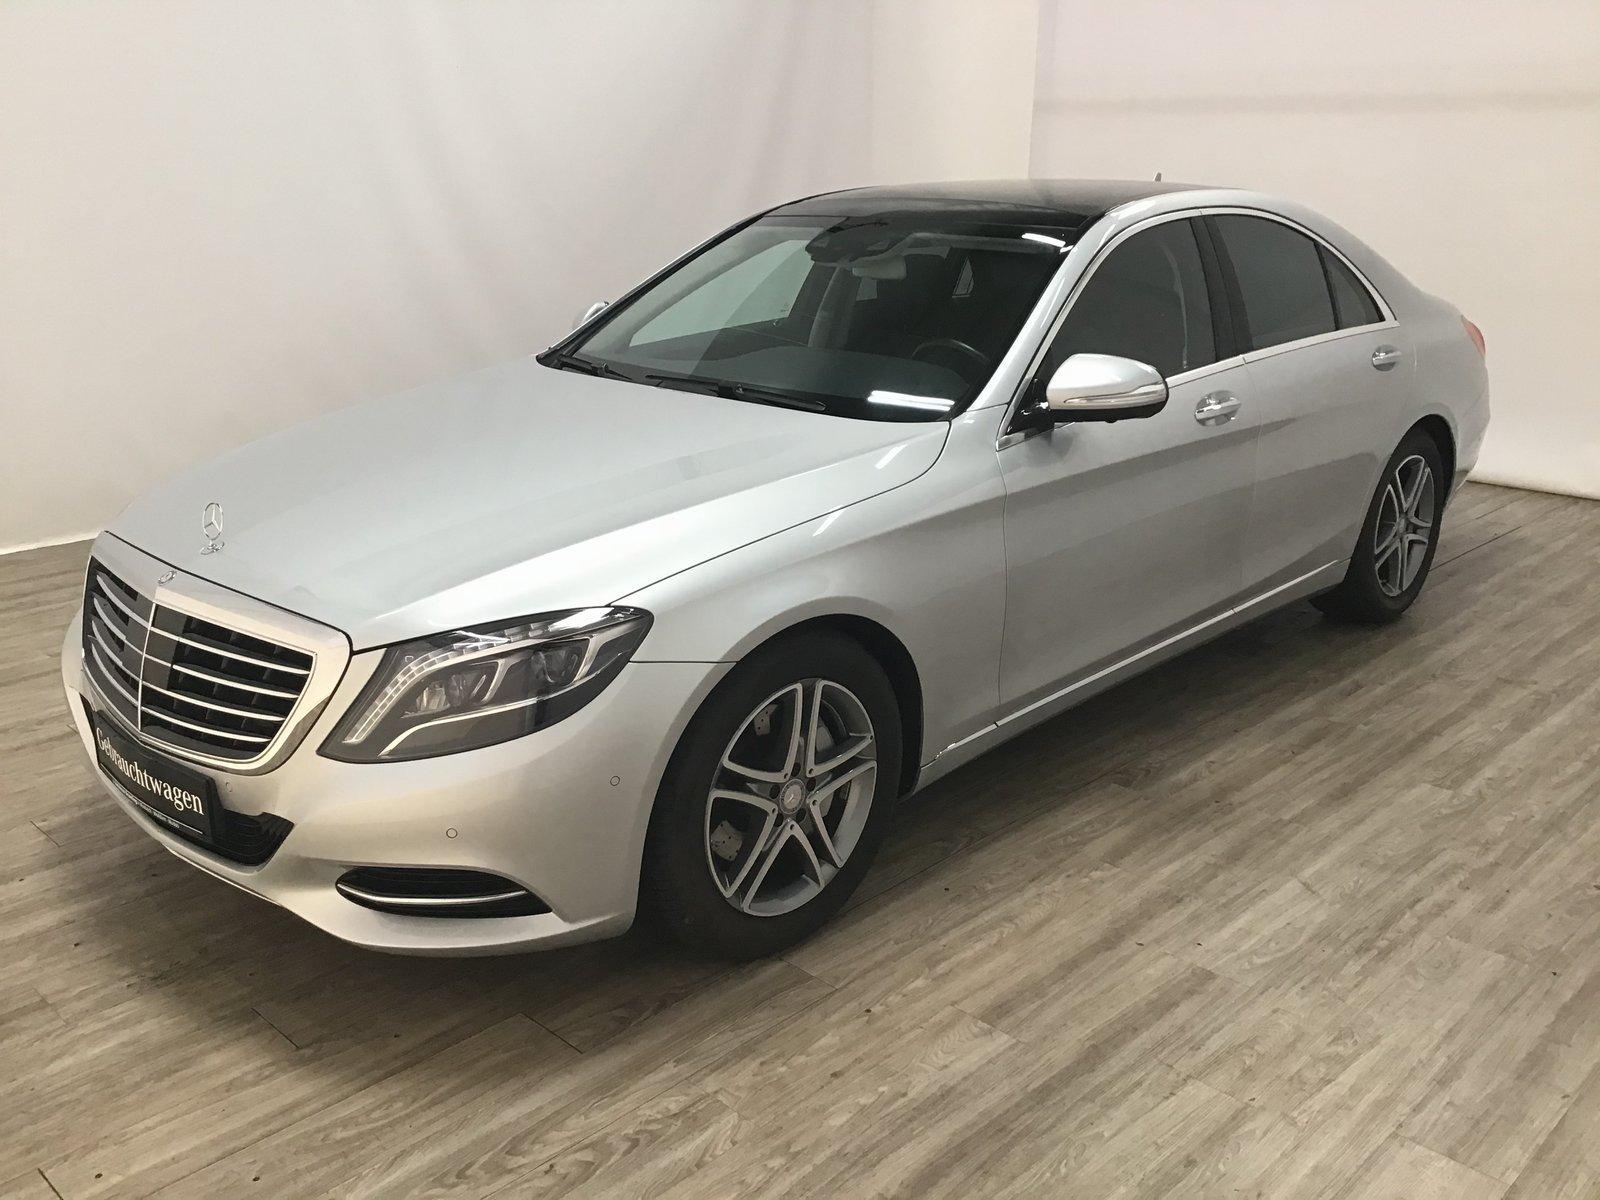 Mercedes-Benz S 350 BT 4M Distronic*Pano*Sitzklima*ILS*COMAND*, Jahr 2014, Diesel